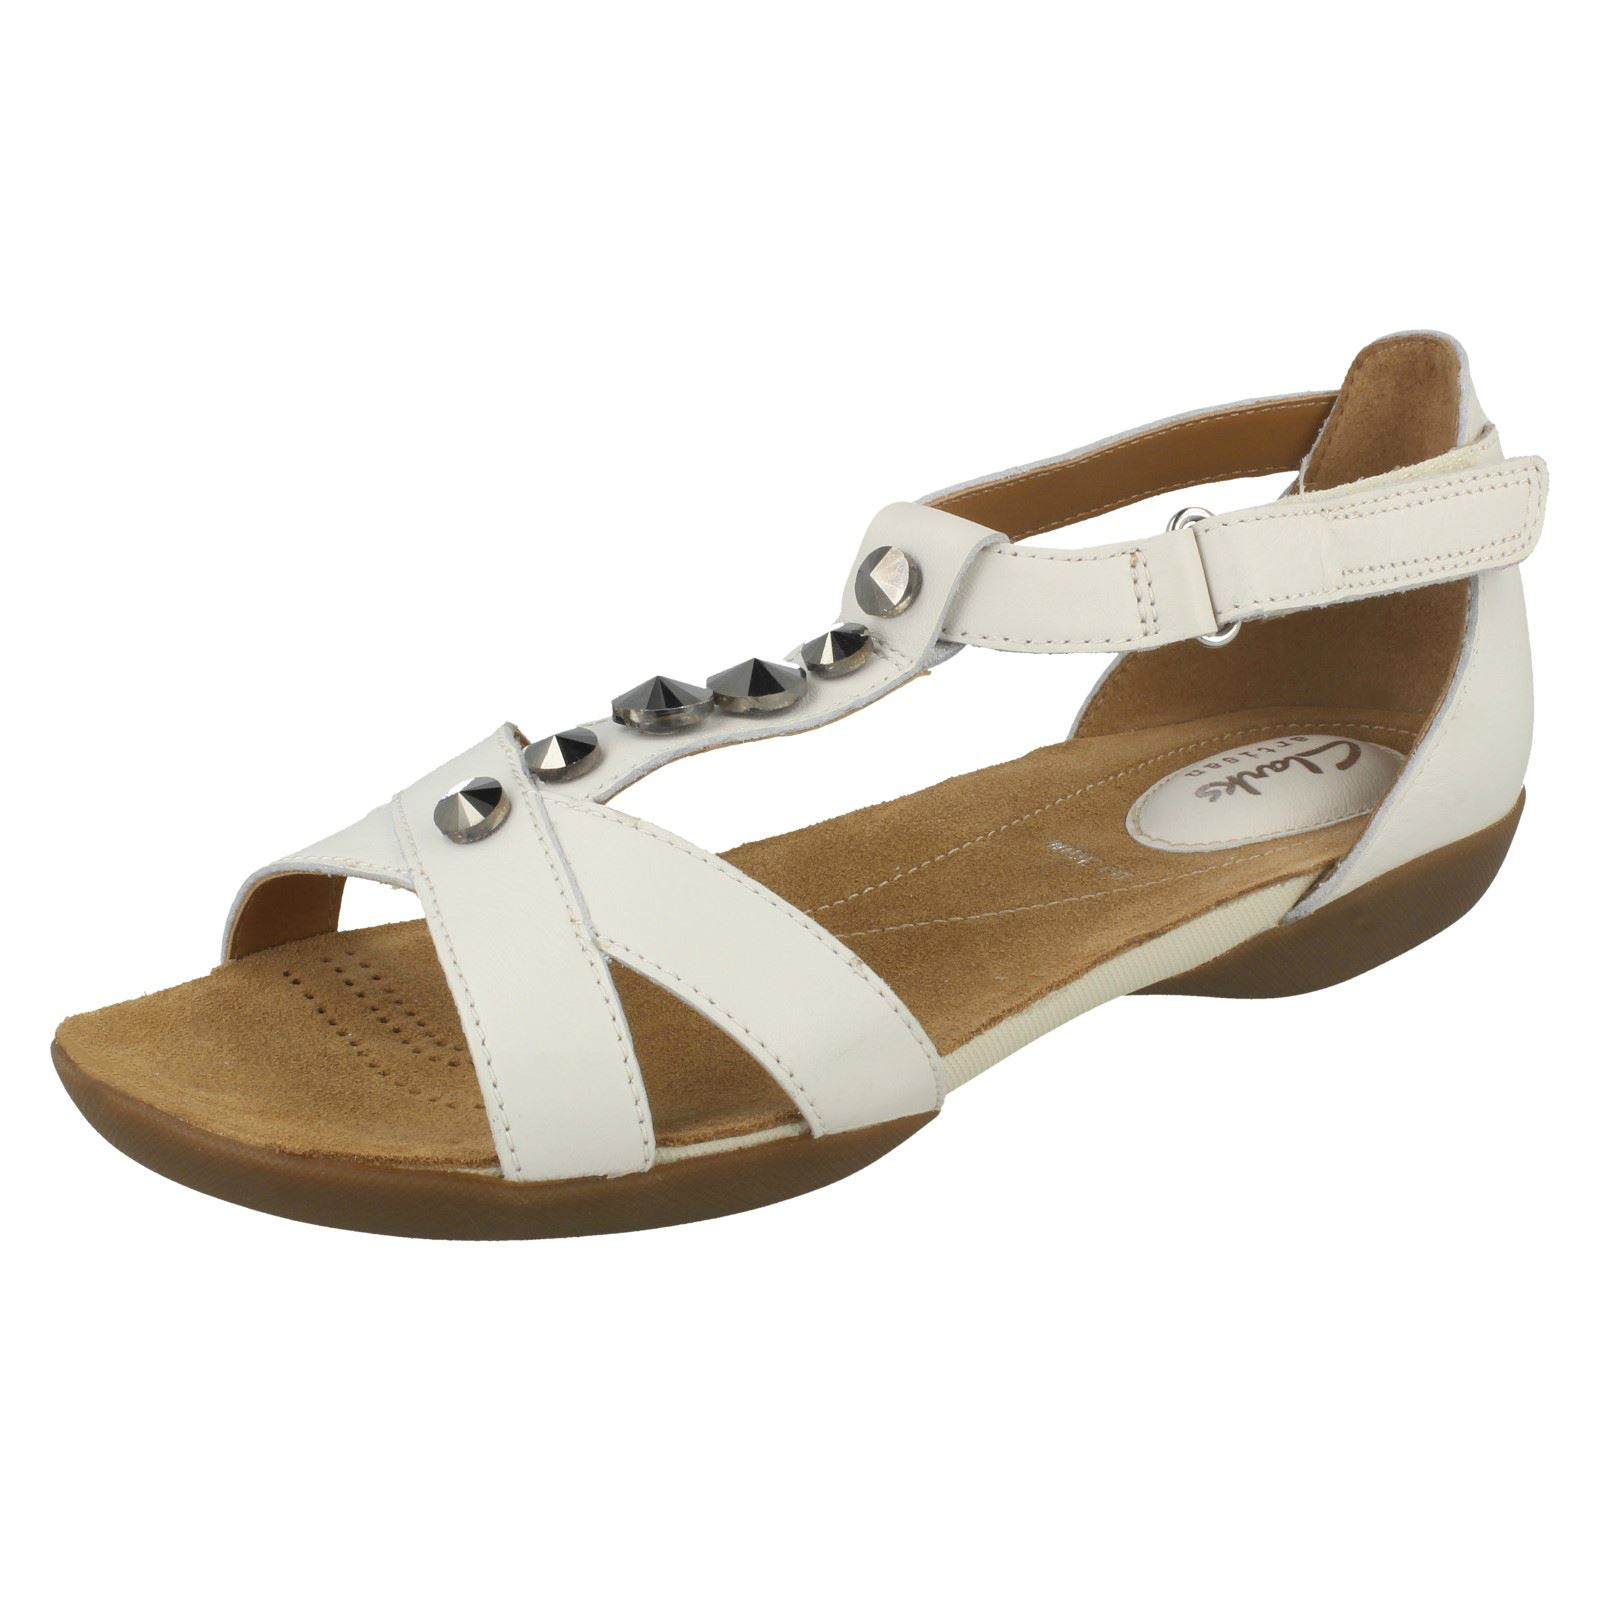 Ladies Clarks T Bar Flat Sandals 'Raffi Scent'